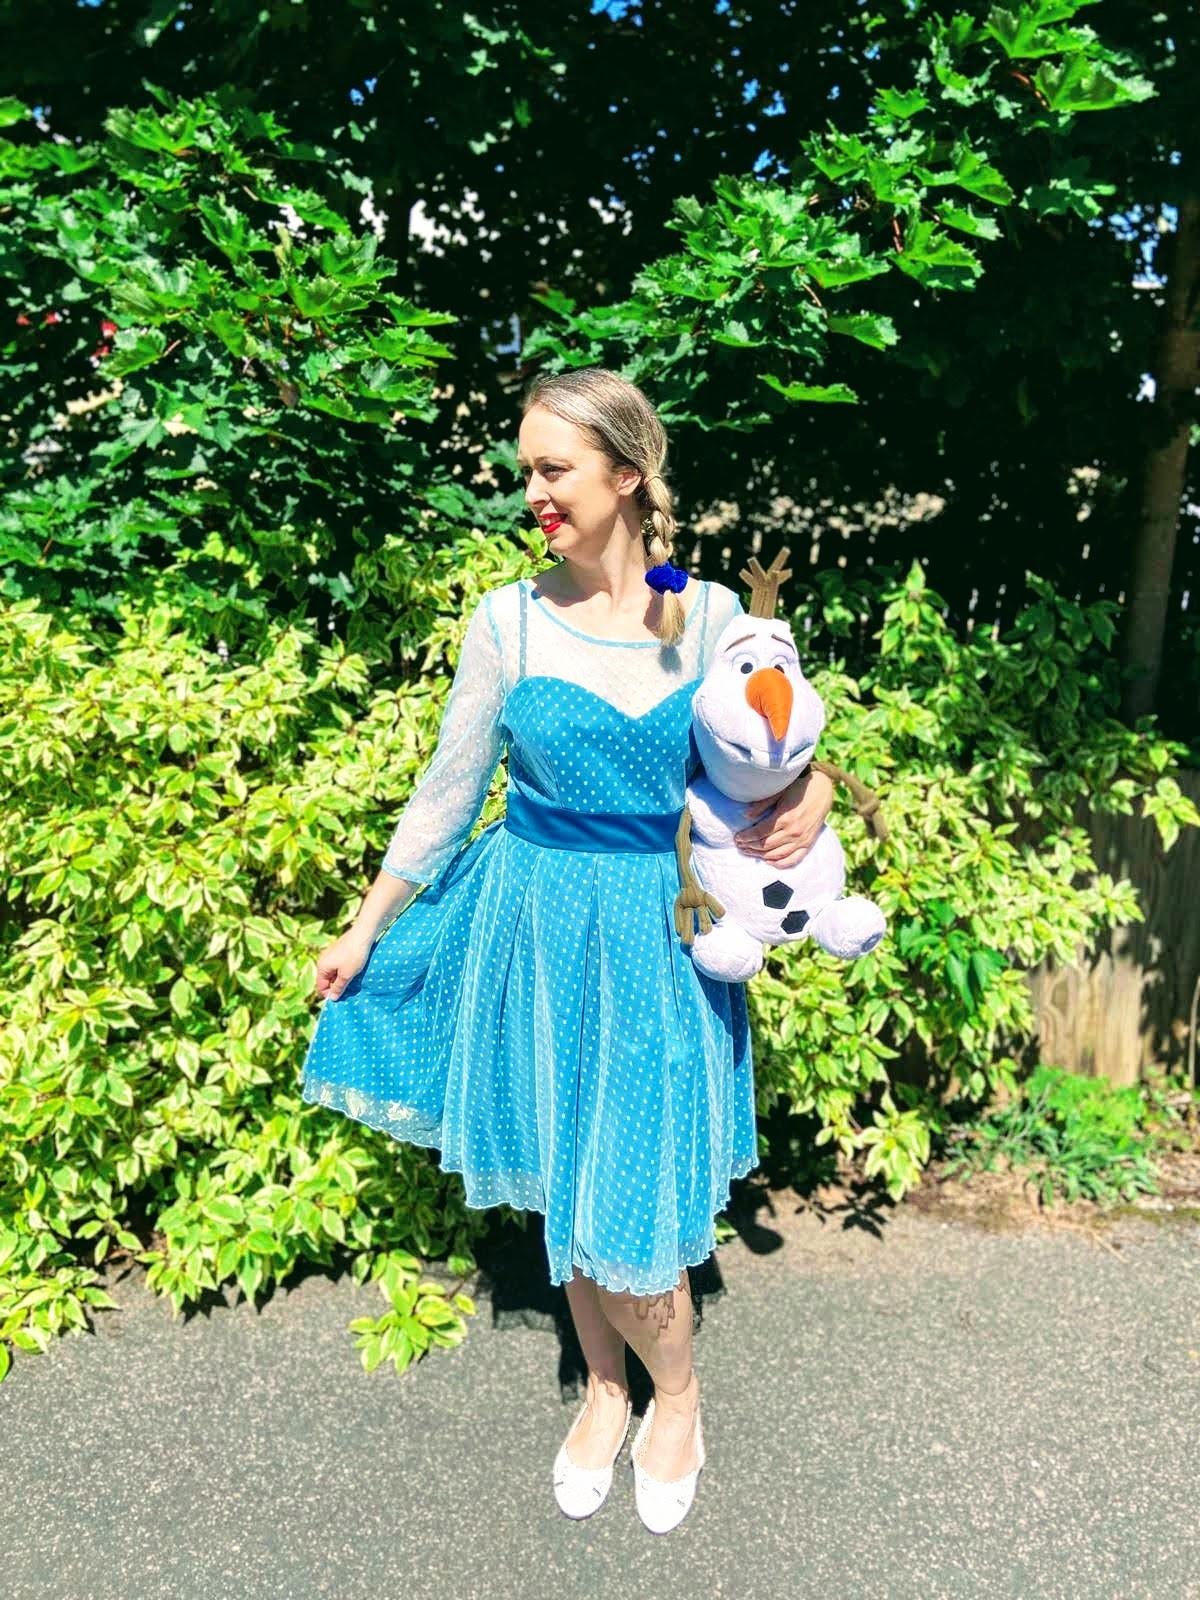 Pale blue dress like Elsa